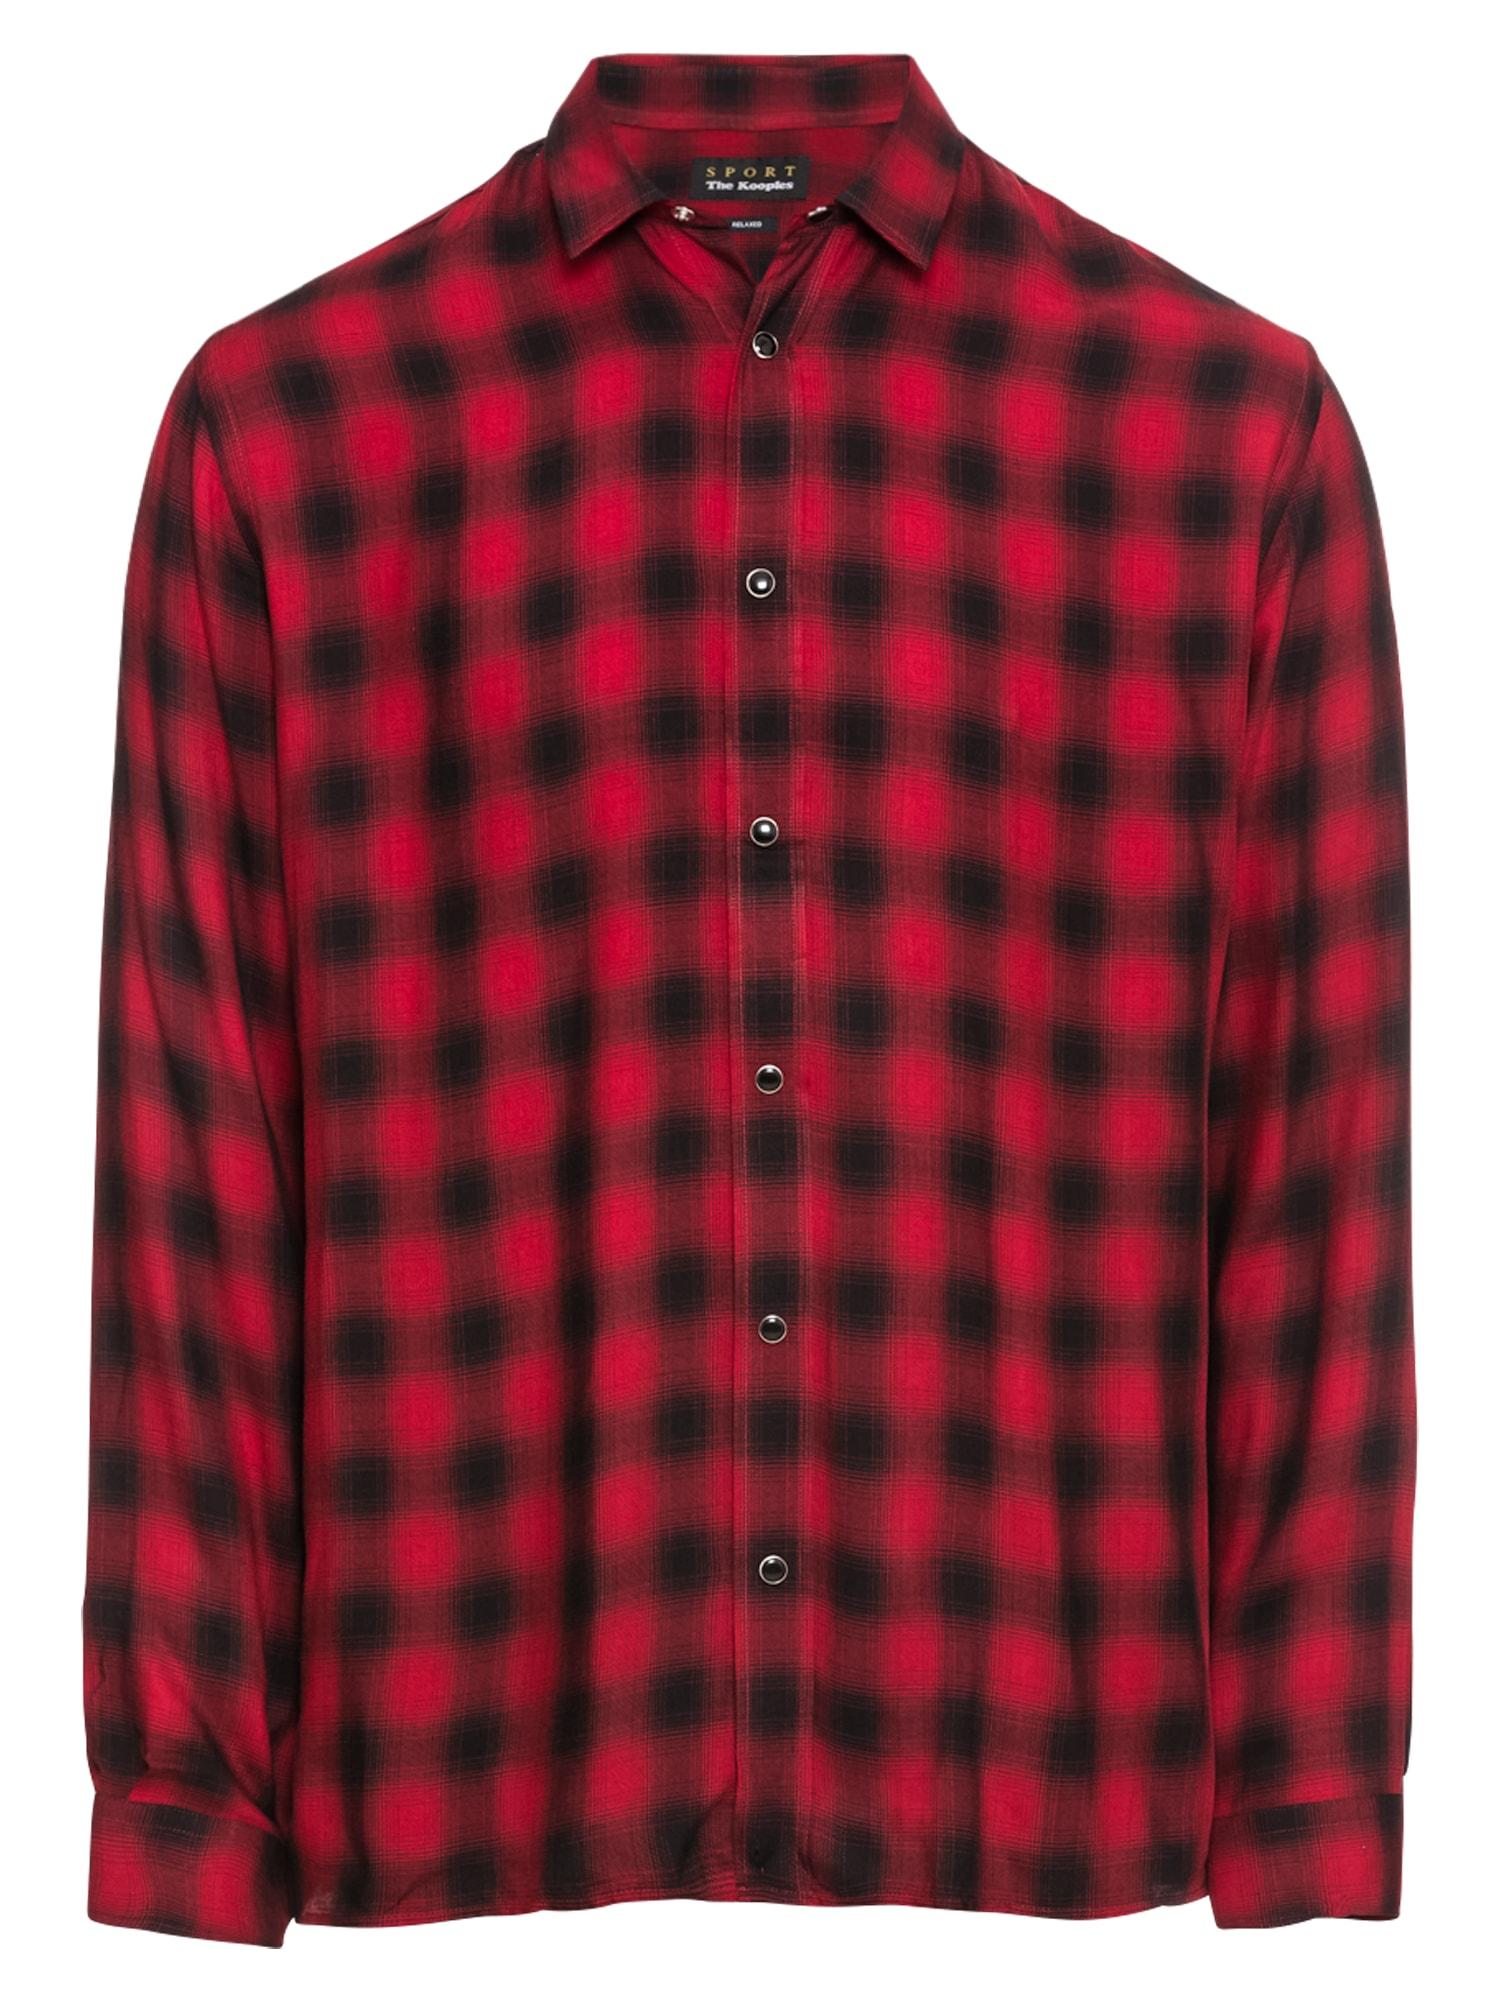 Košile SHIRT WITH A CLASSIC COLLAR modrá červená THE KOOPLES SPORT